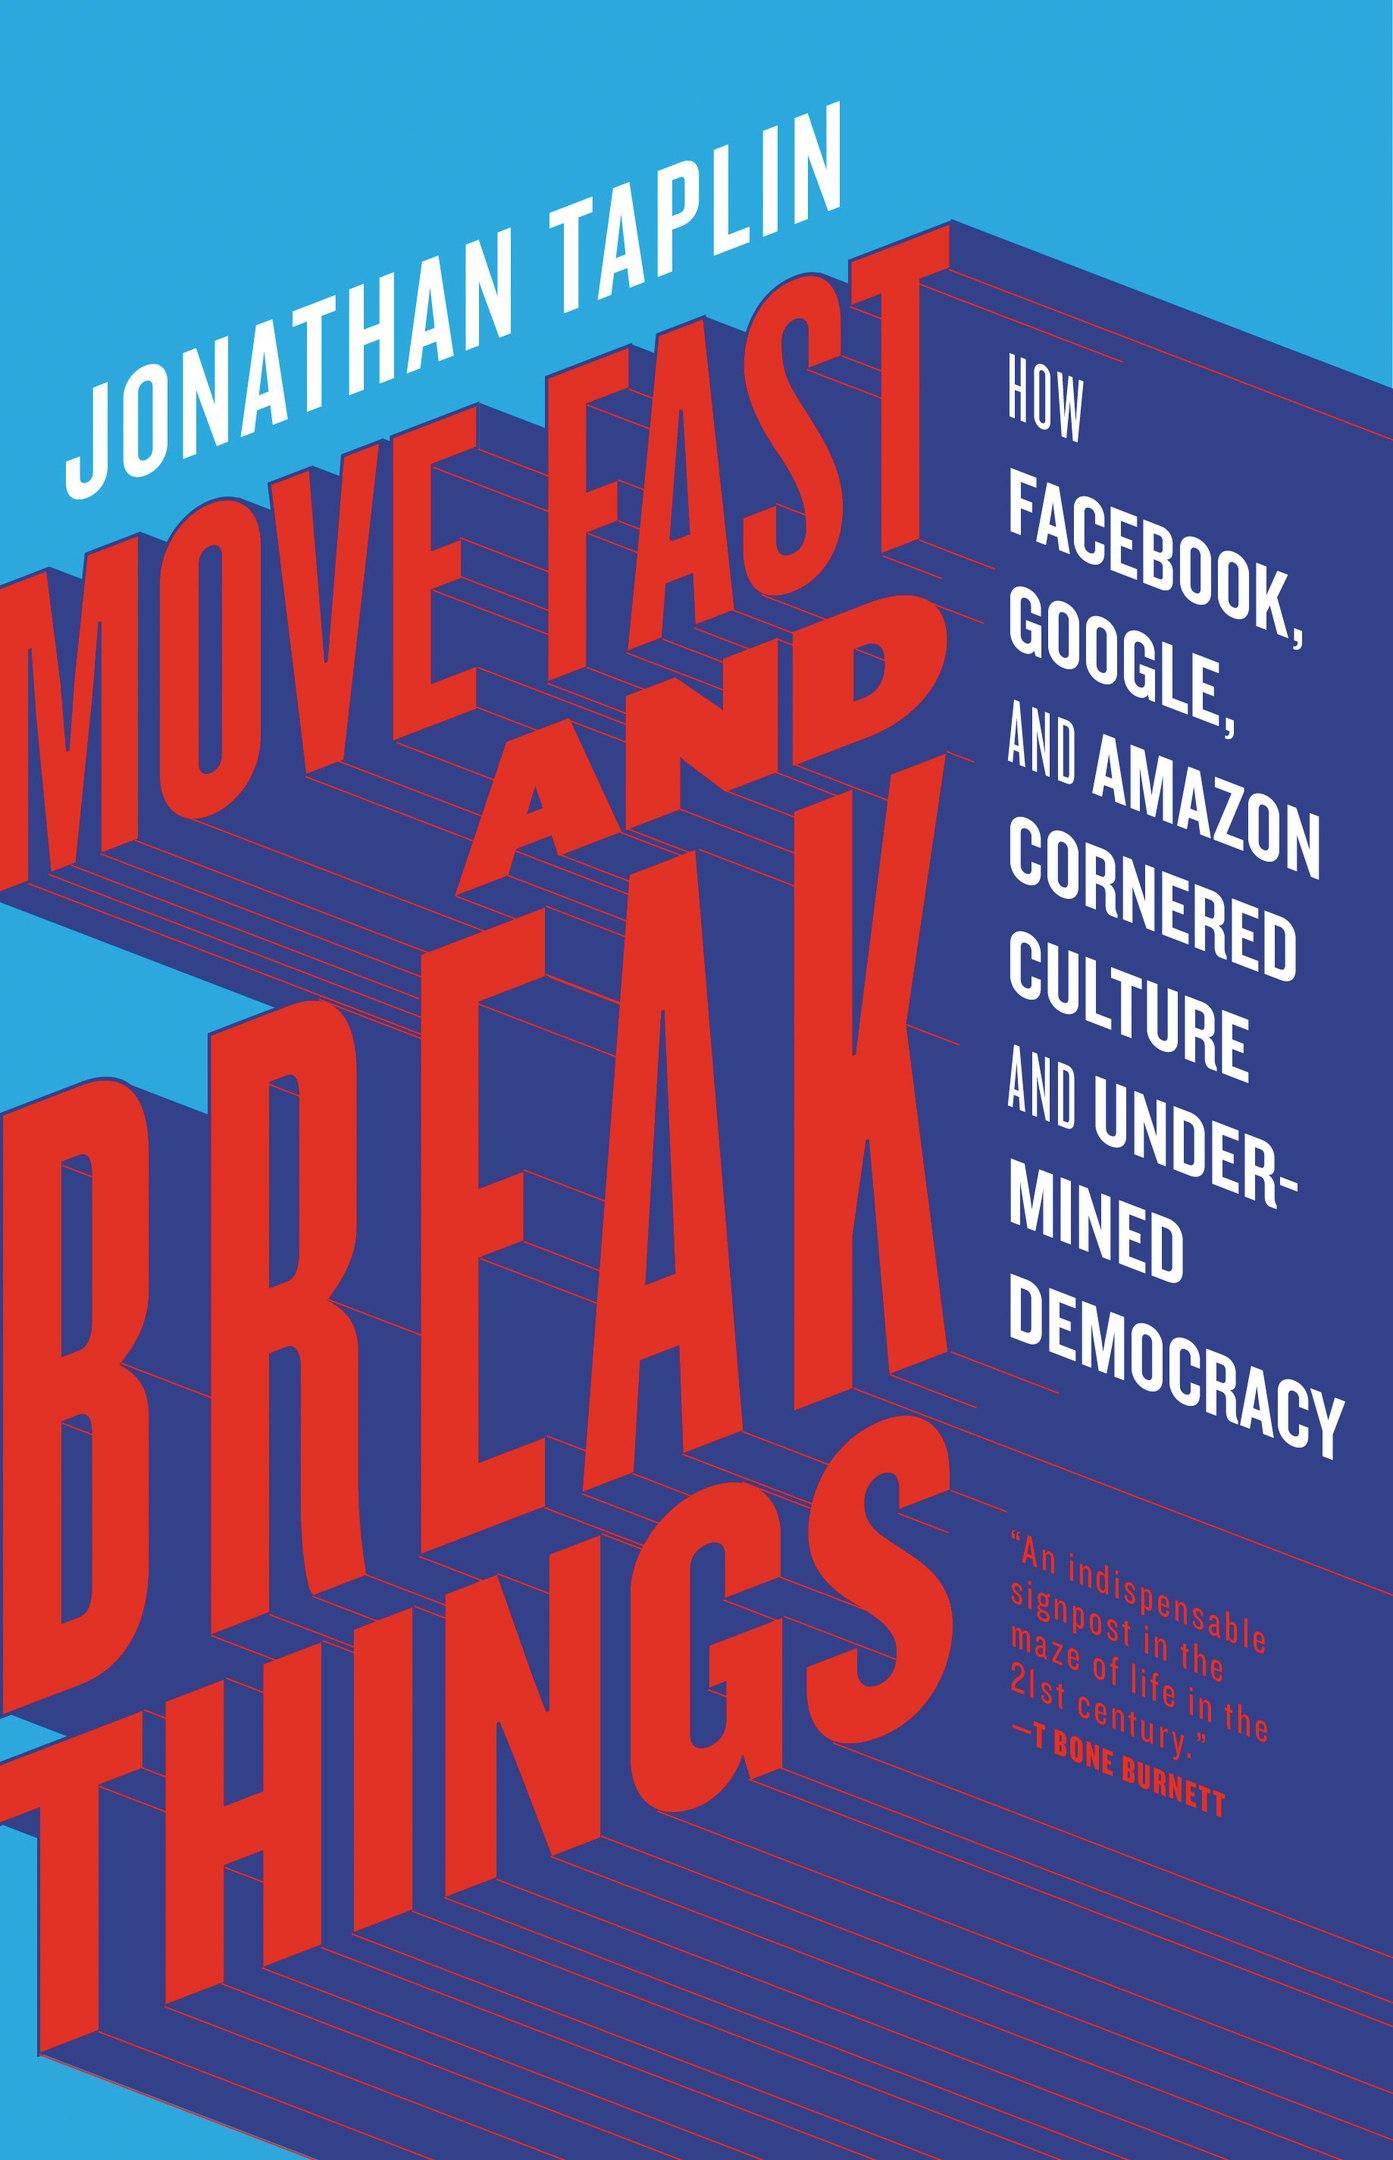 Jonathan Taplin – Move Fast And Break Things